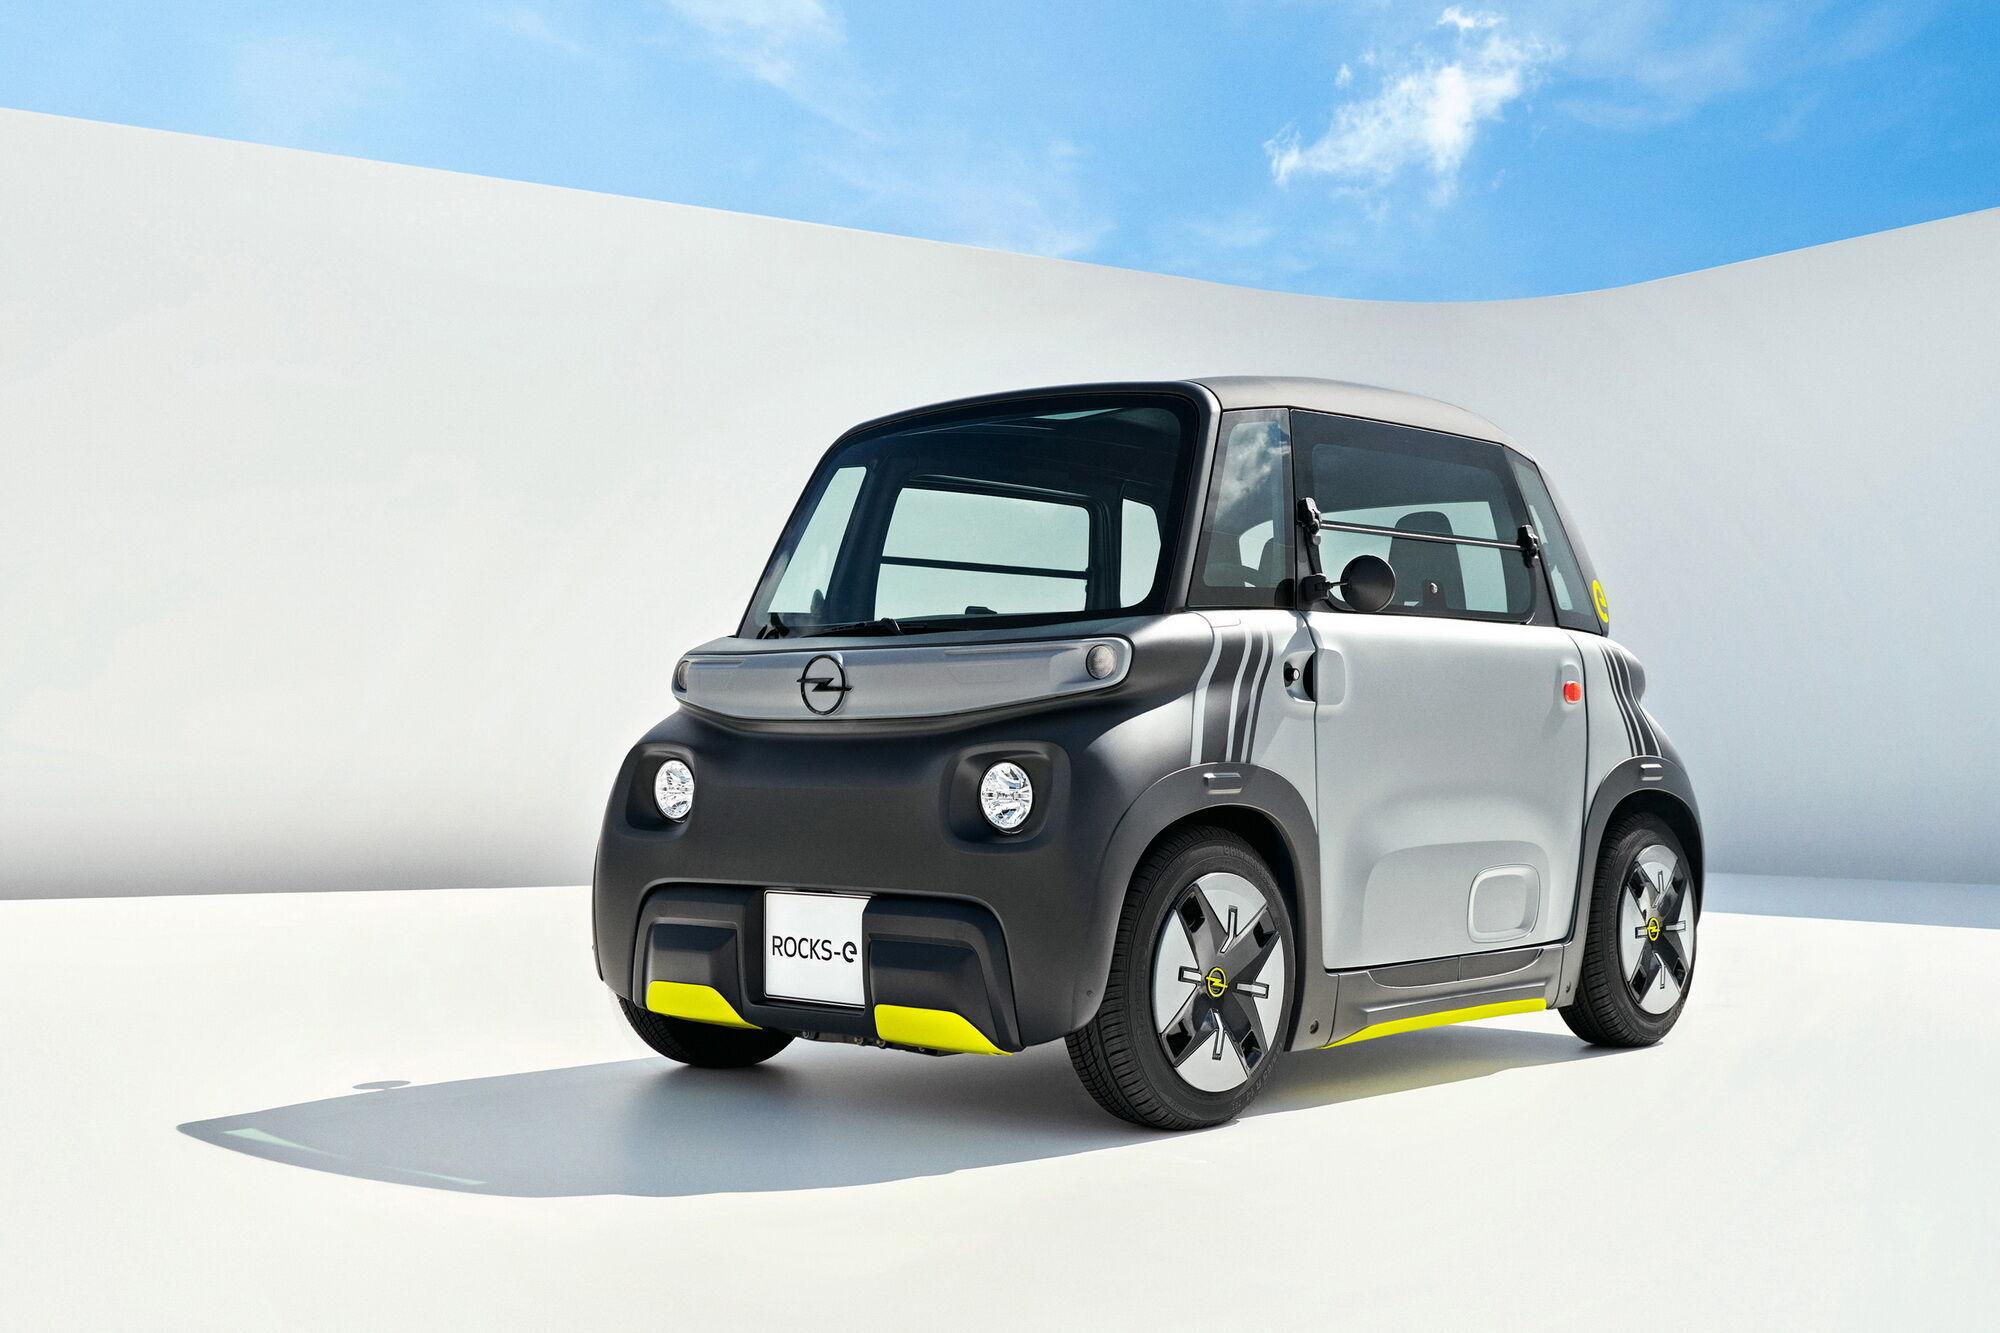 Opel показал городской электромобиль Rocks-e | Электромобили | OBOZREVATEL